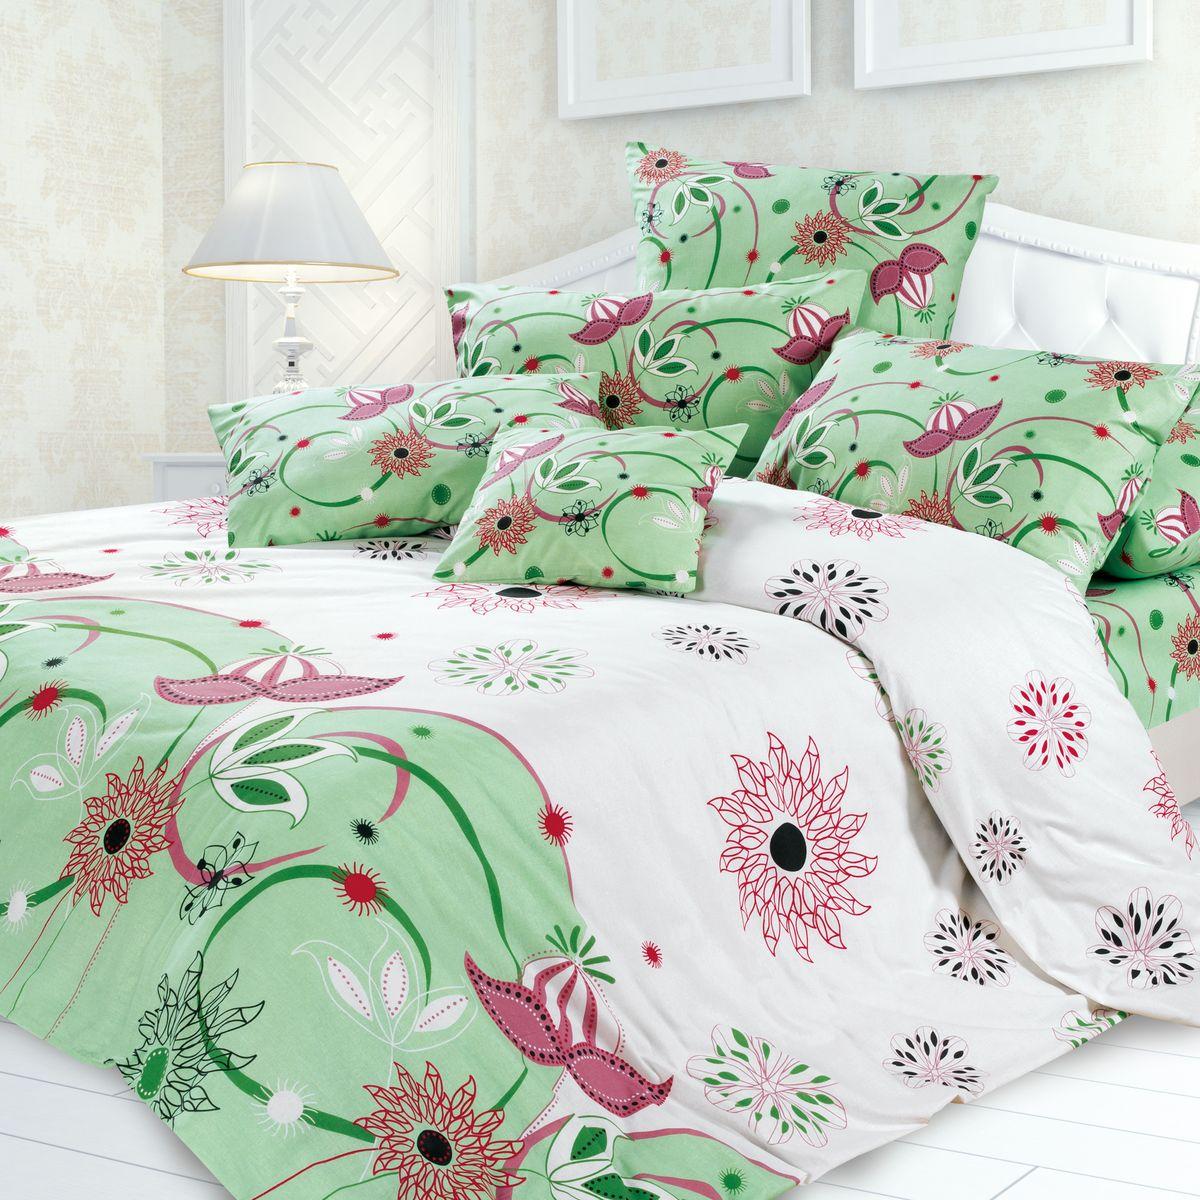 Комплект белья Унисон Моник, евро, наволочки 70 x 70, цвет: зеленый. 239634239634